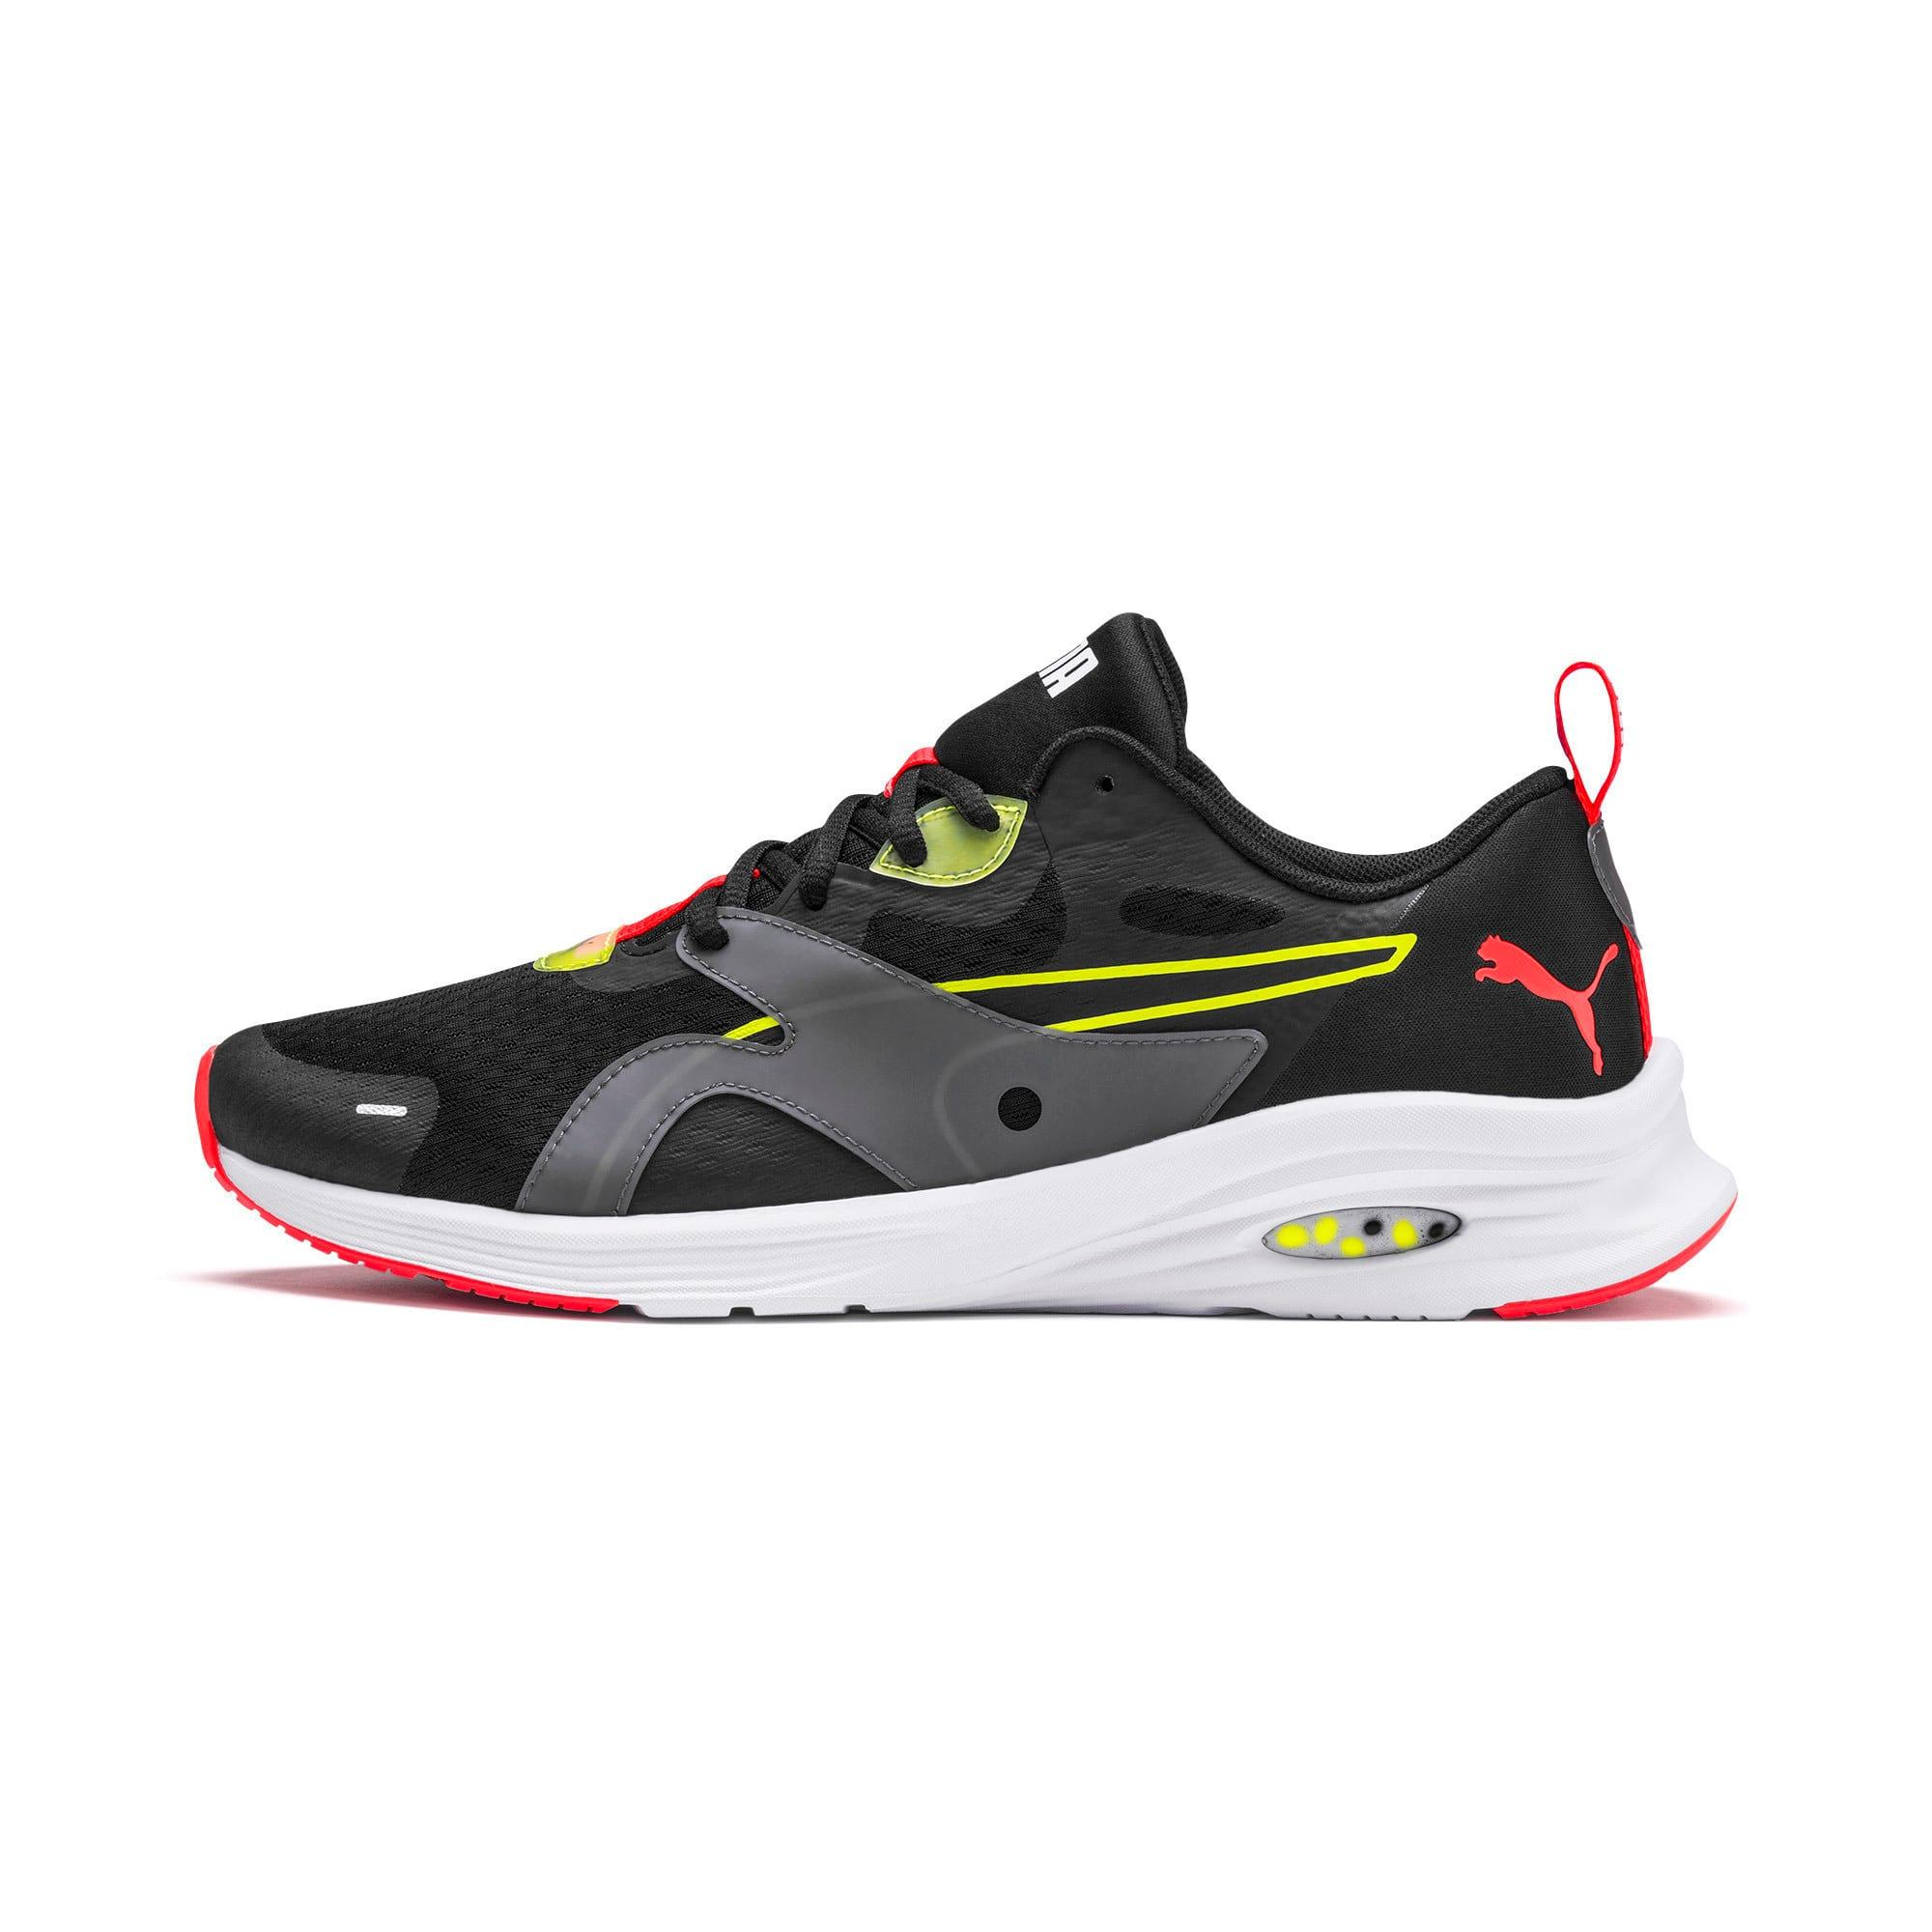 2puma scarpe running uomo